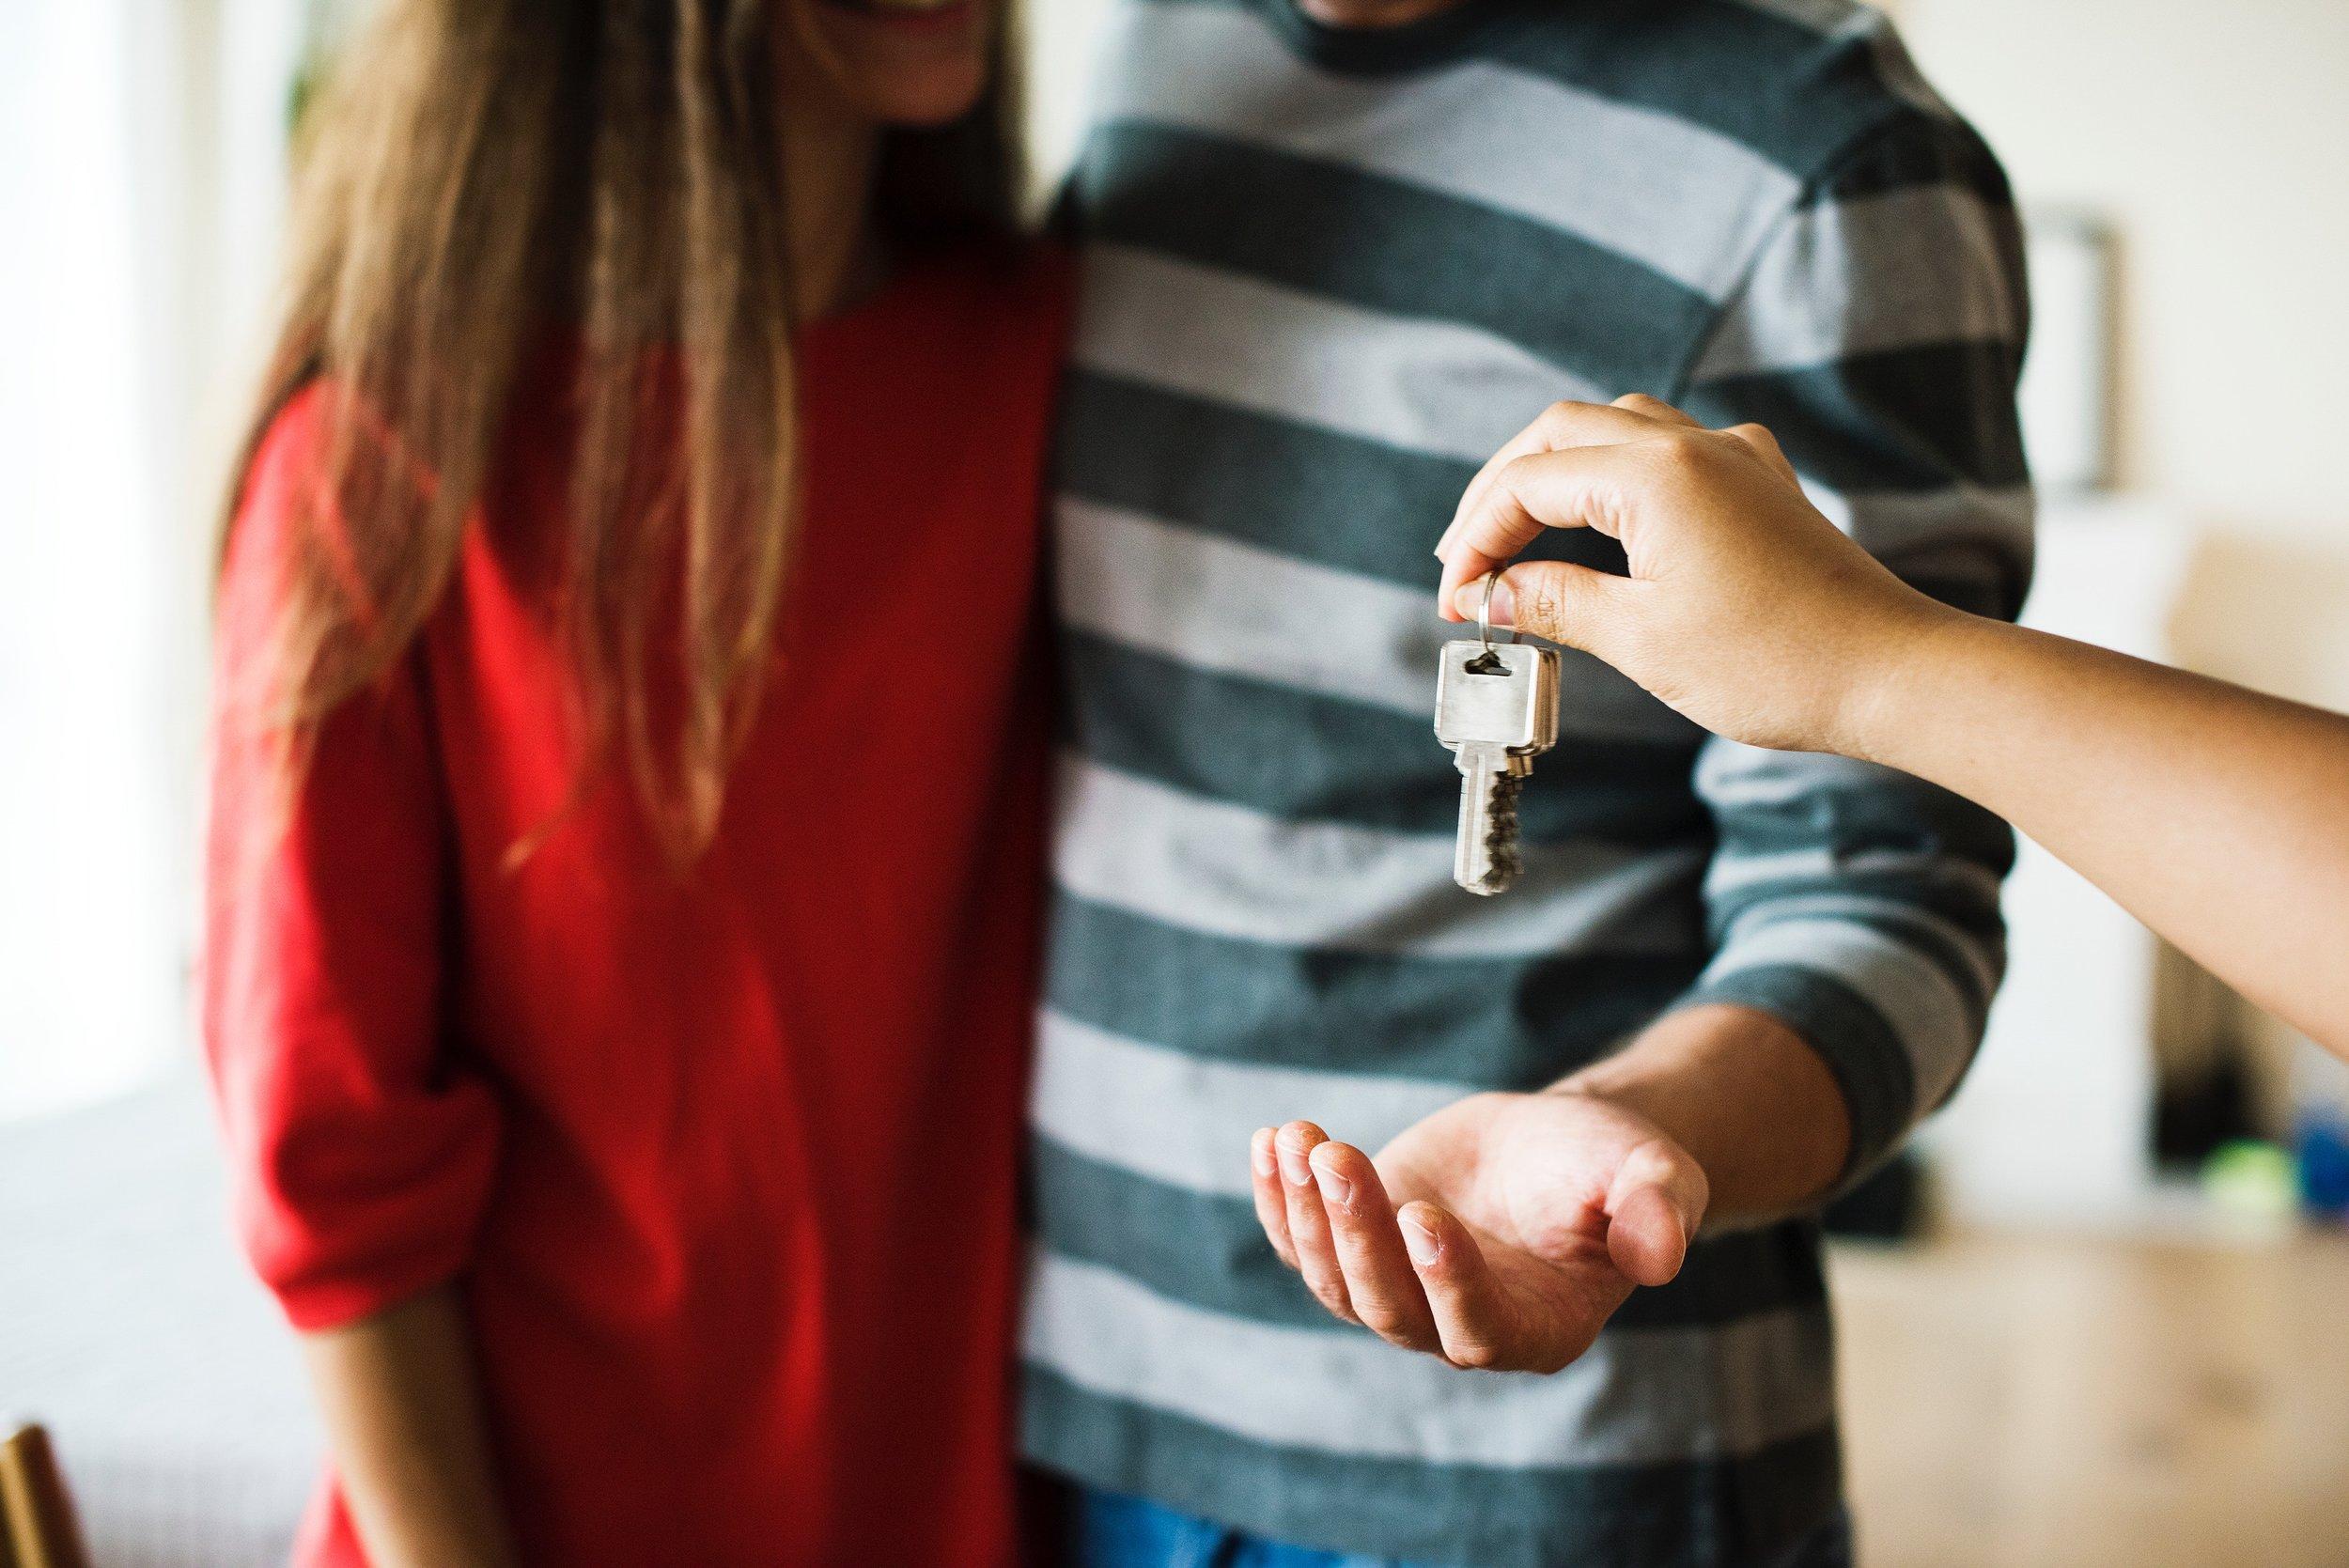 couple-investment-key-1288482.jpg